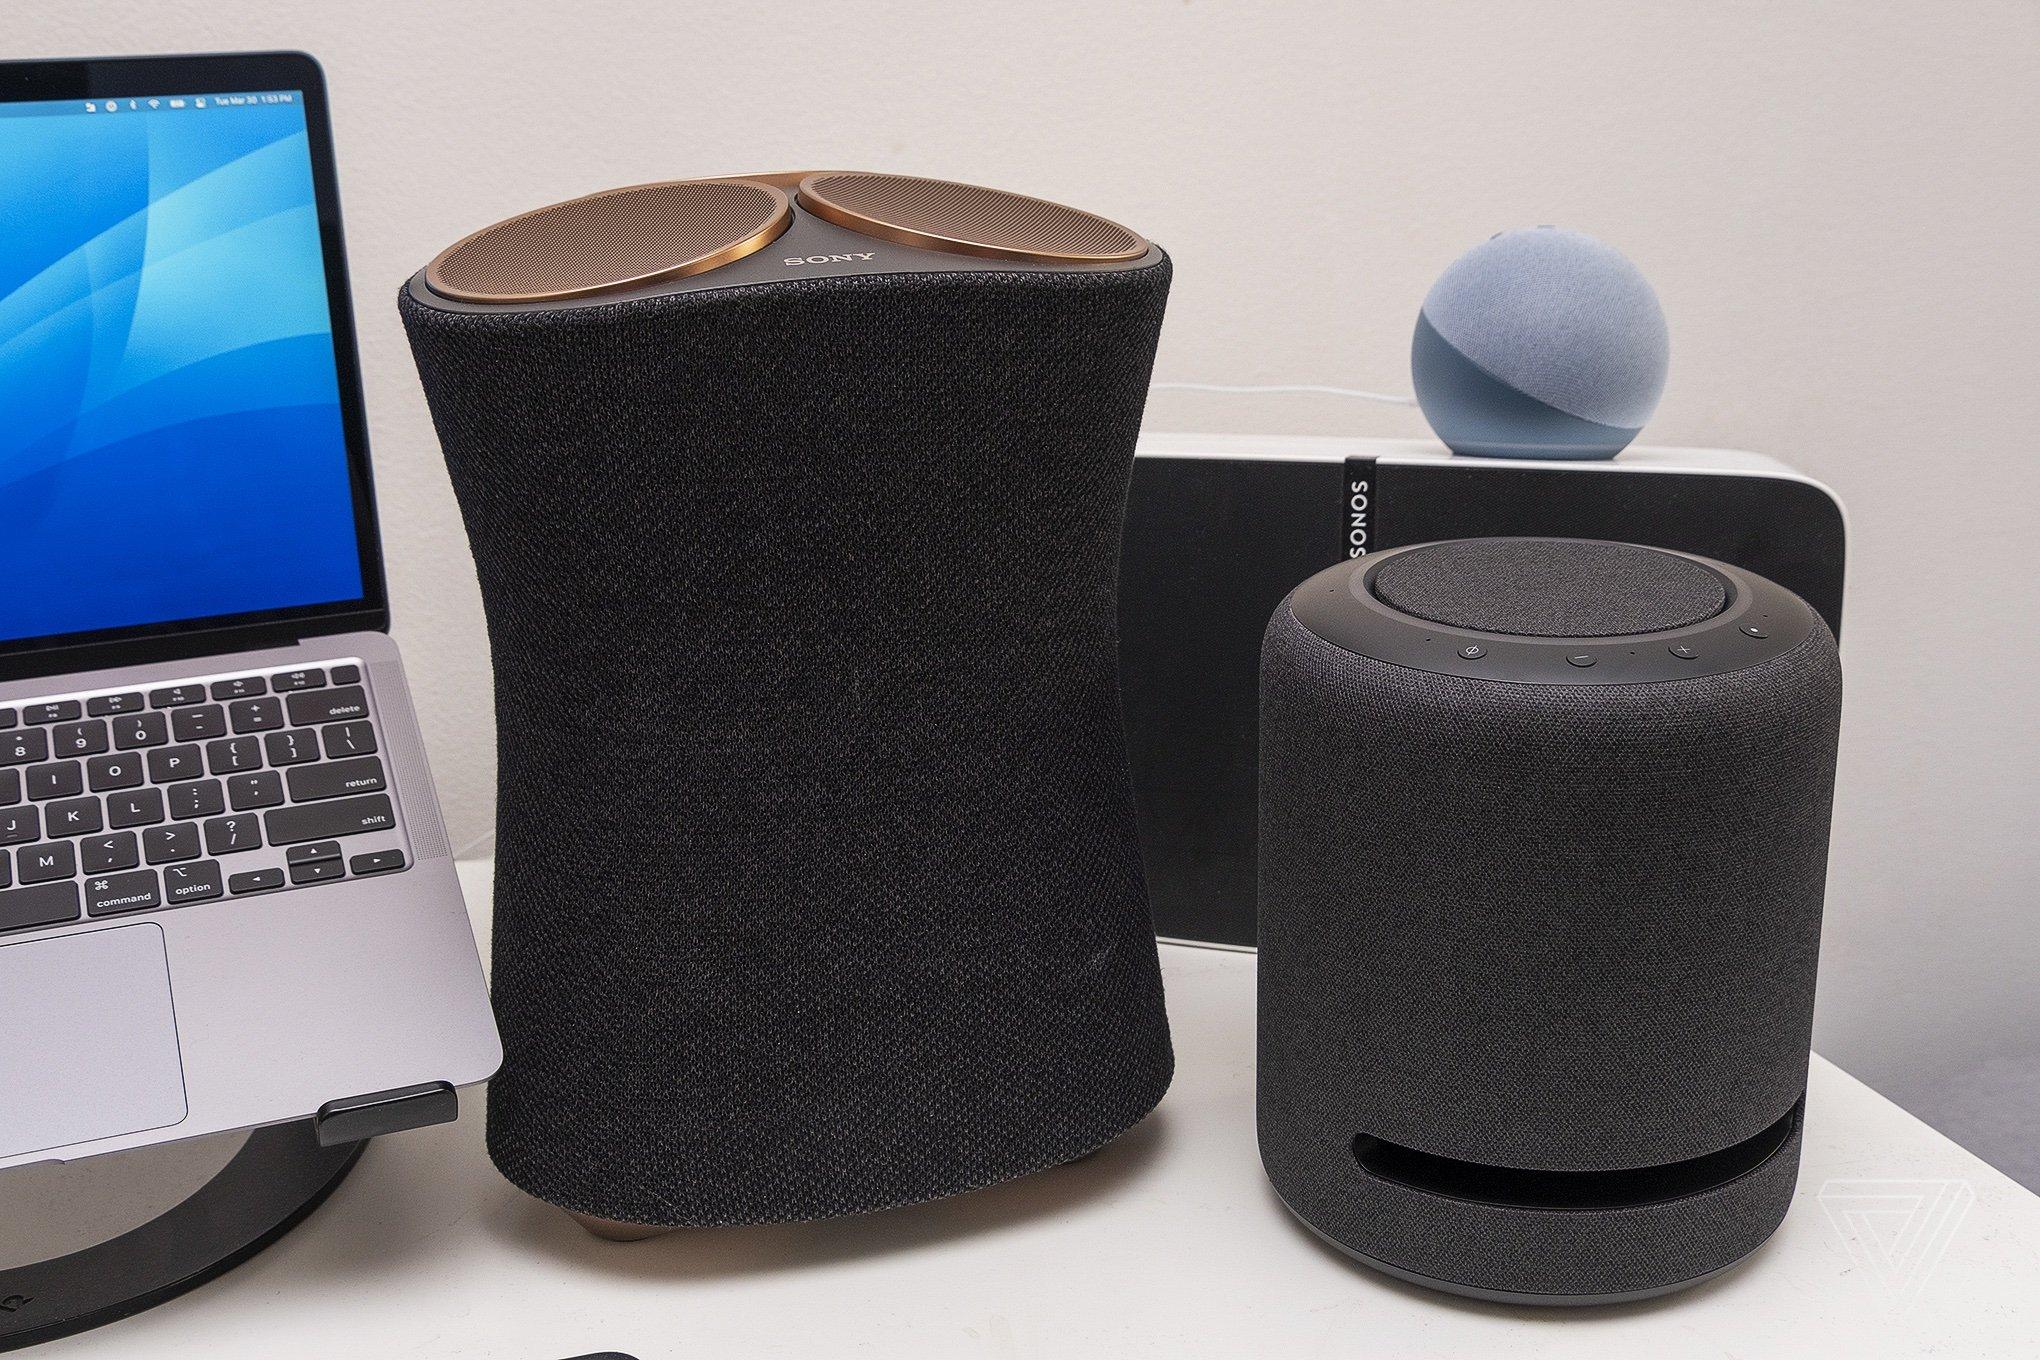 It dwarfs most other smart speakers.